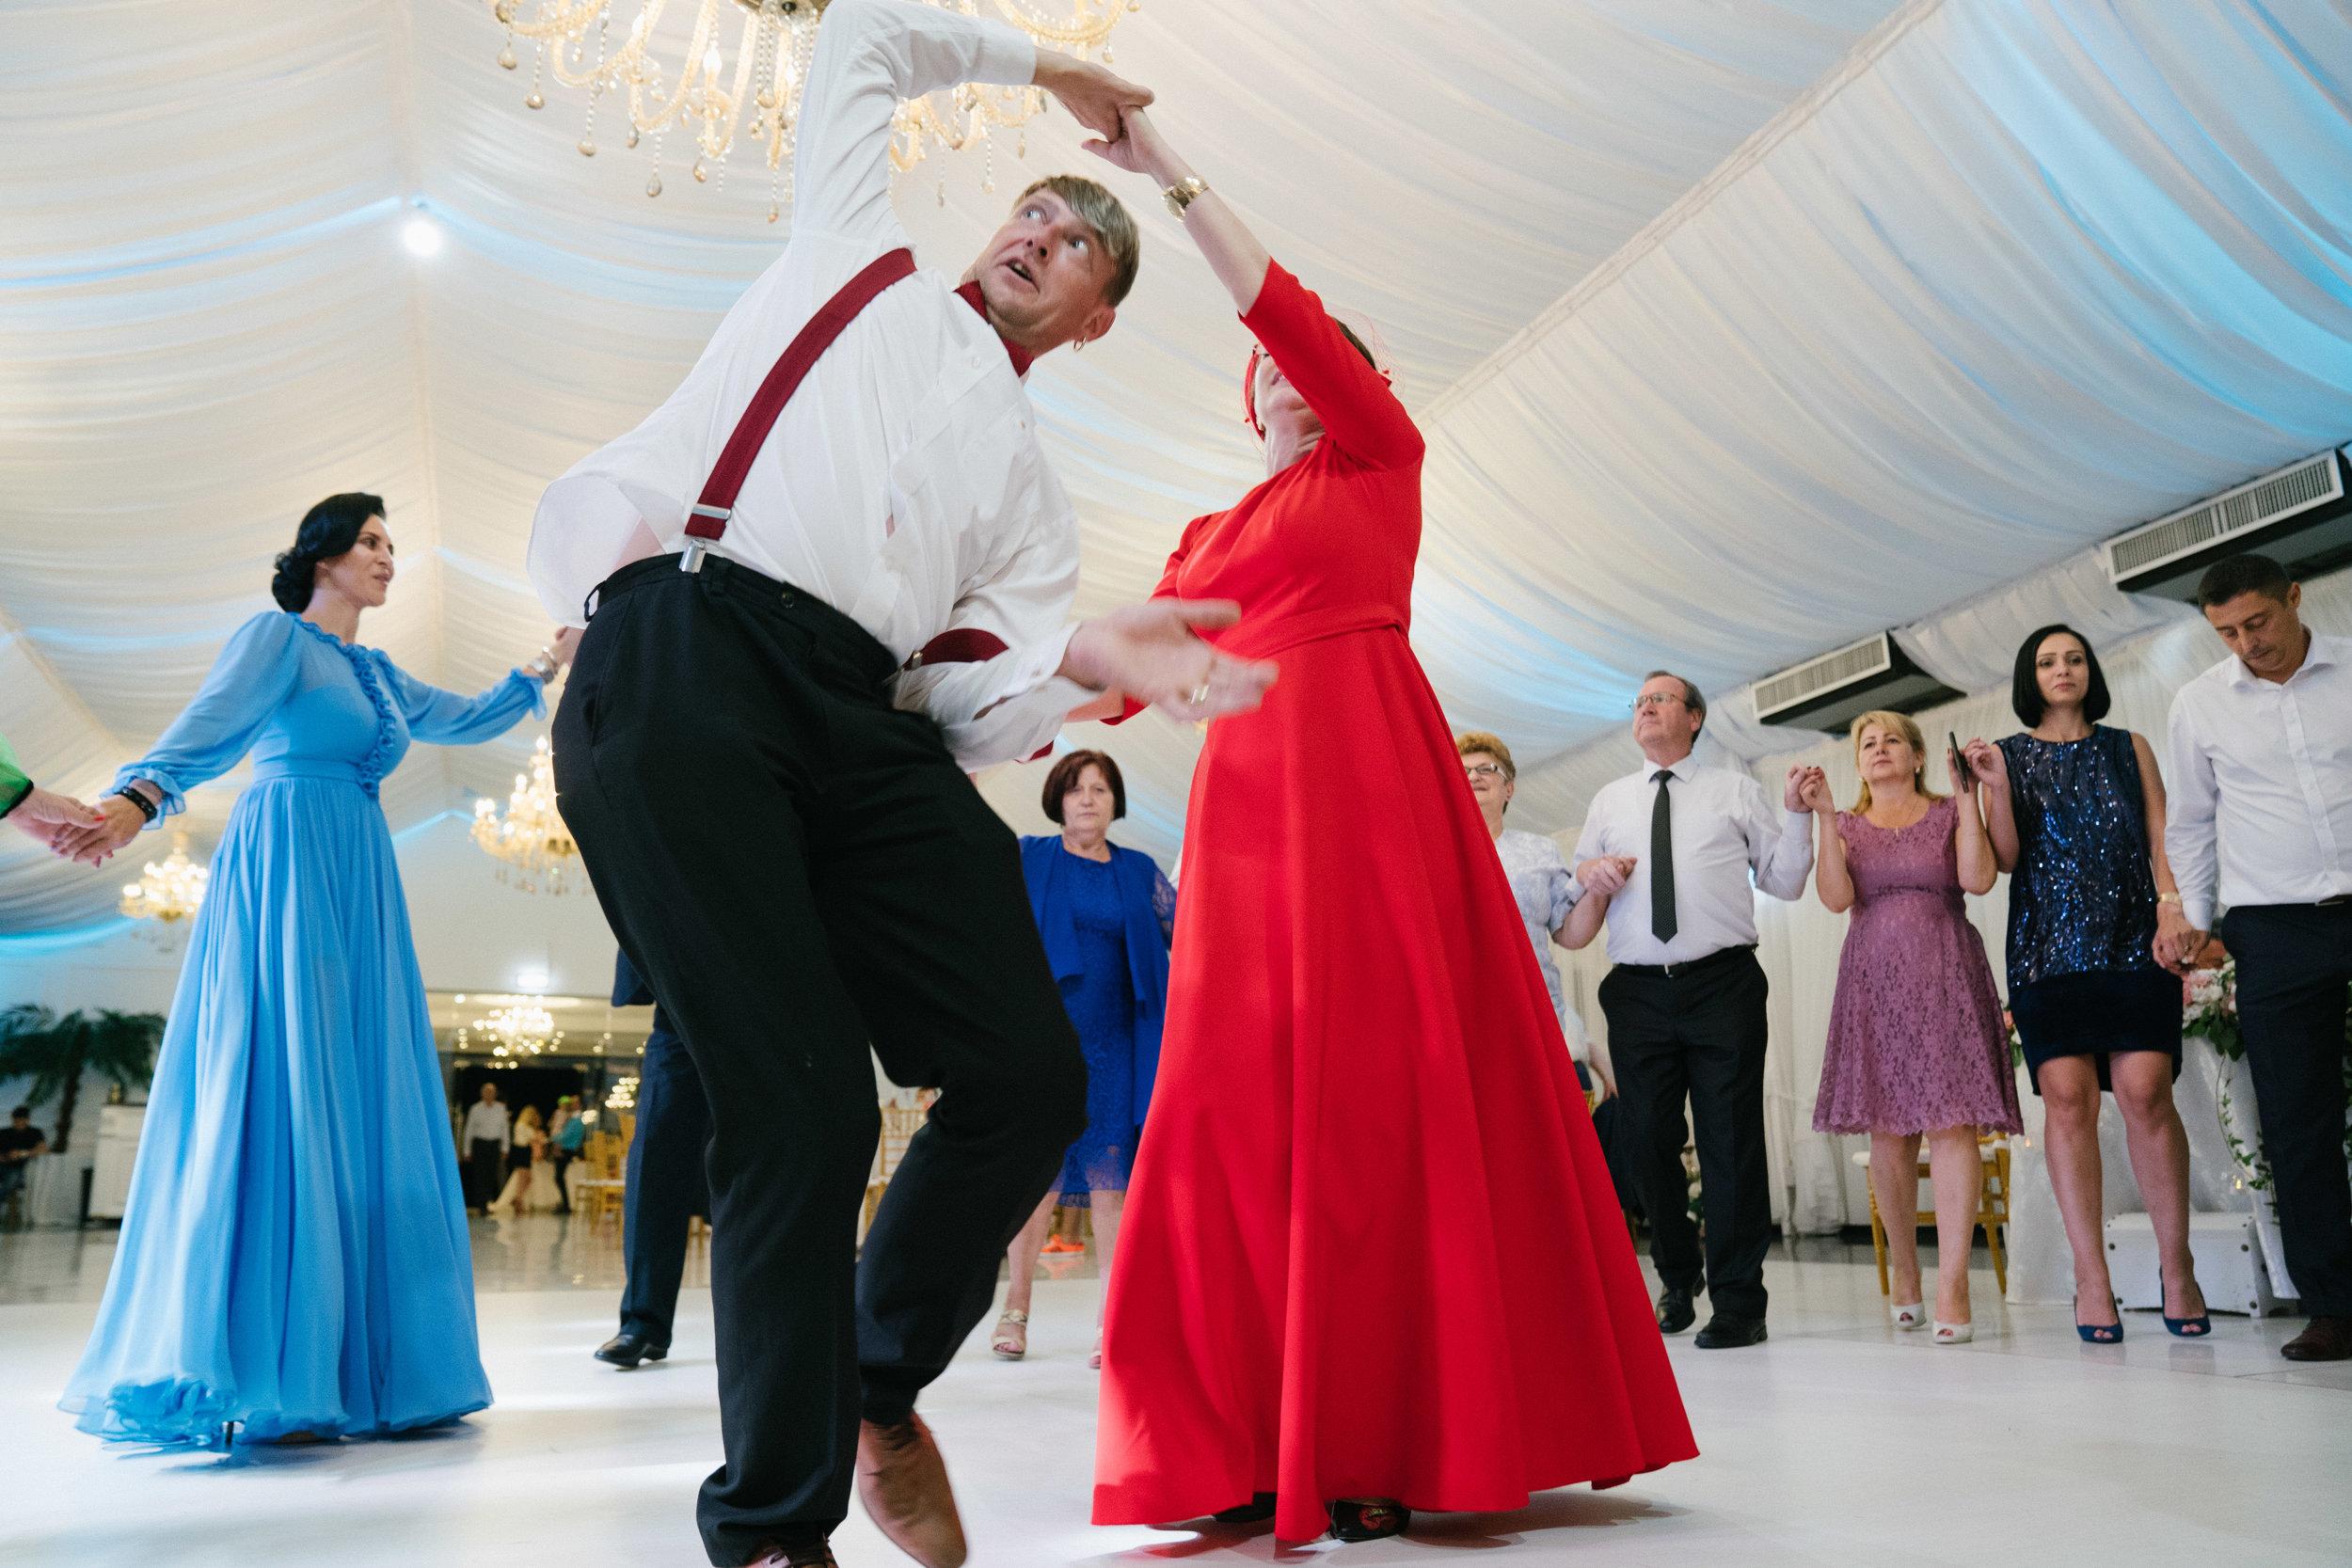 london-romania-destination-wedding-photographer-videographer-135